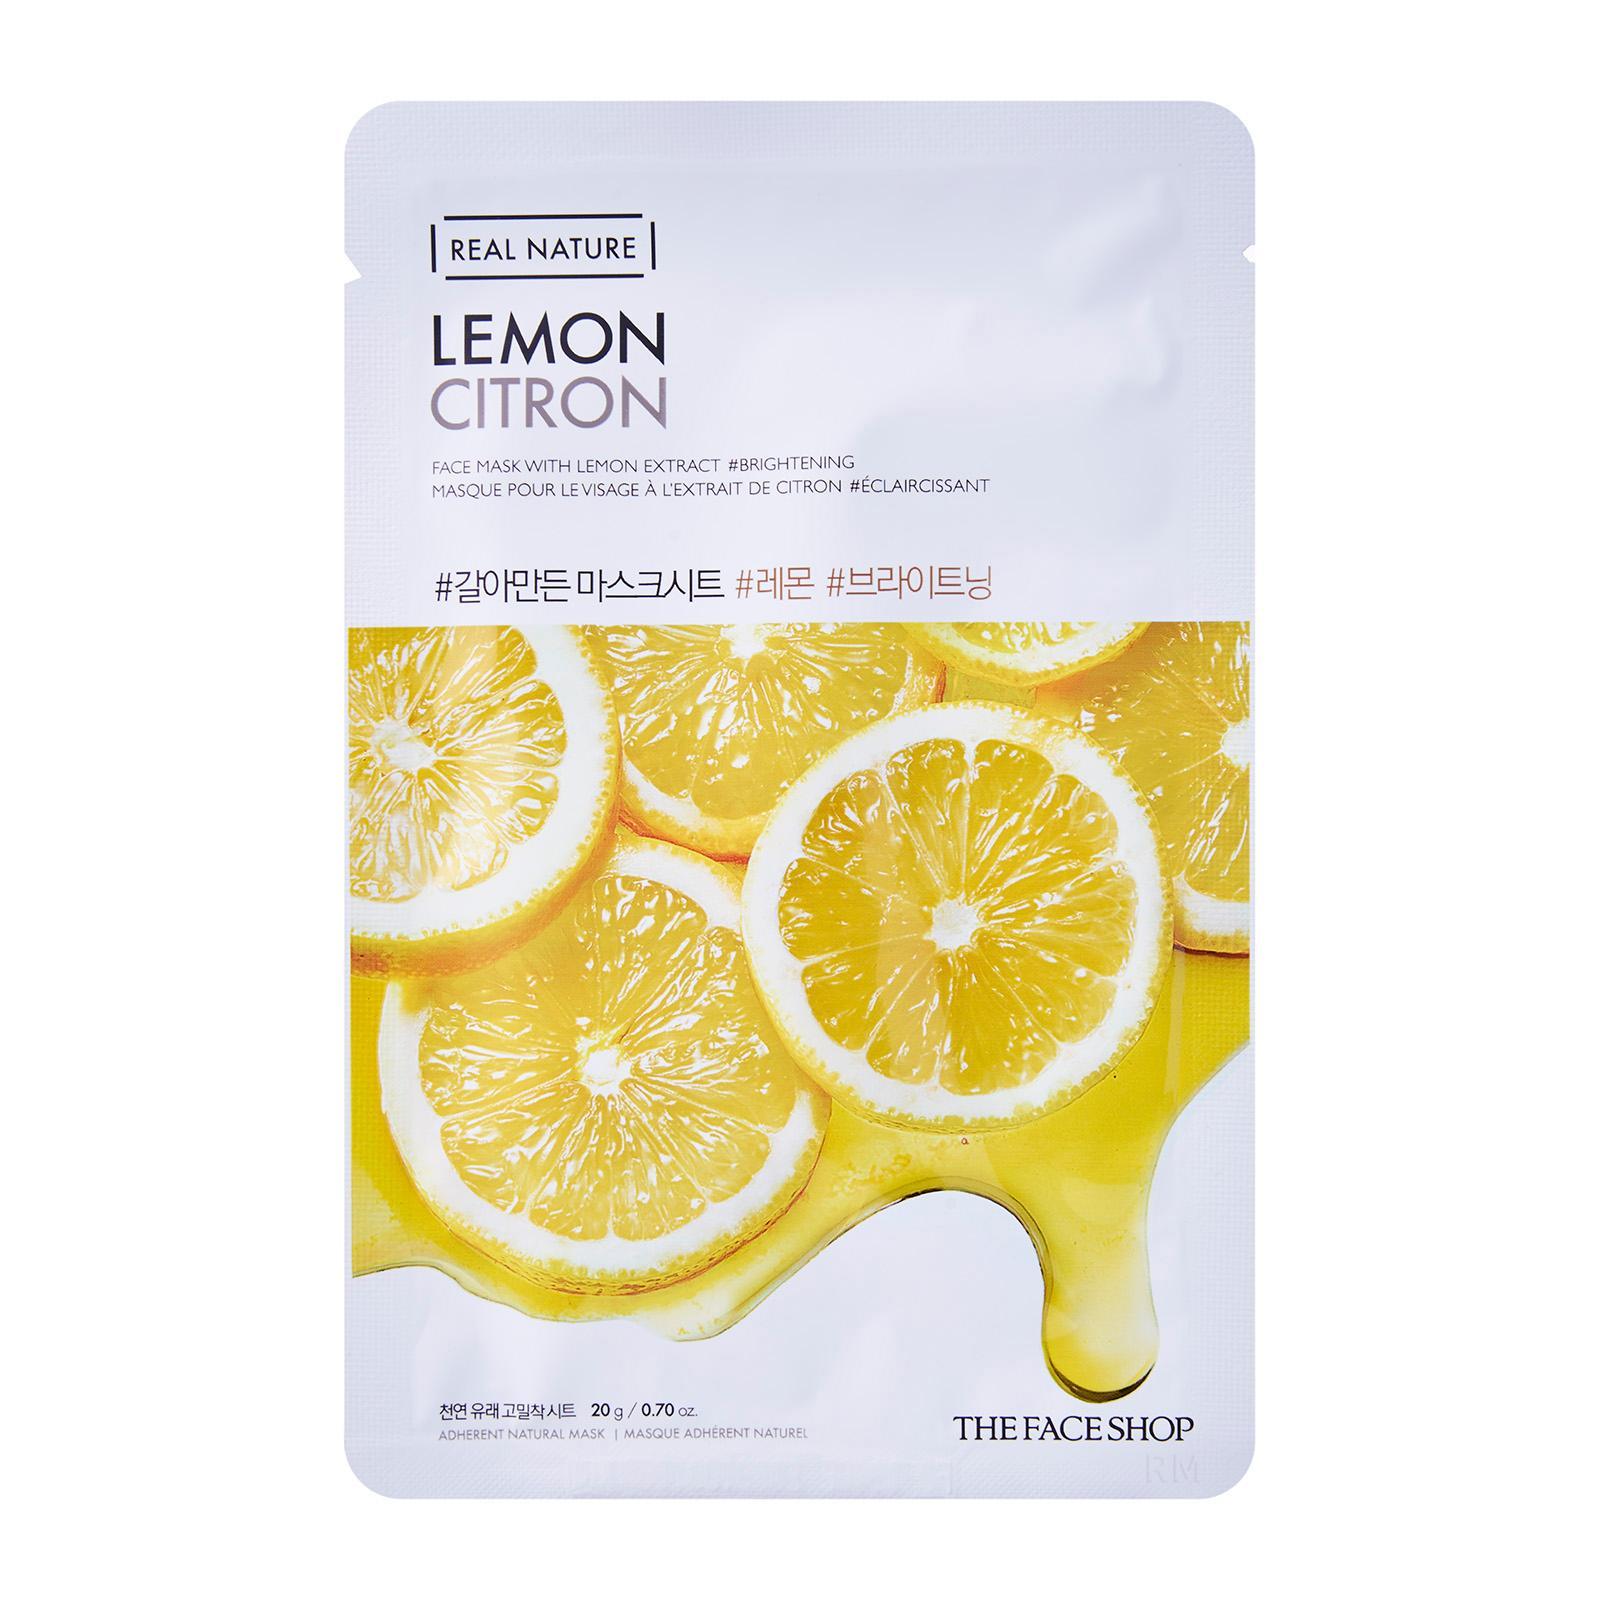 The Face Shop - Real Nature Lemon Face Mask 04 Sheets